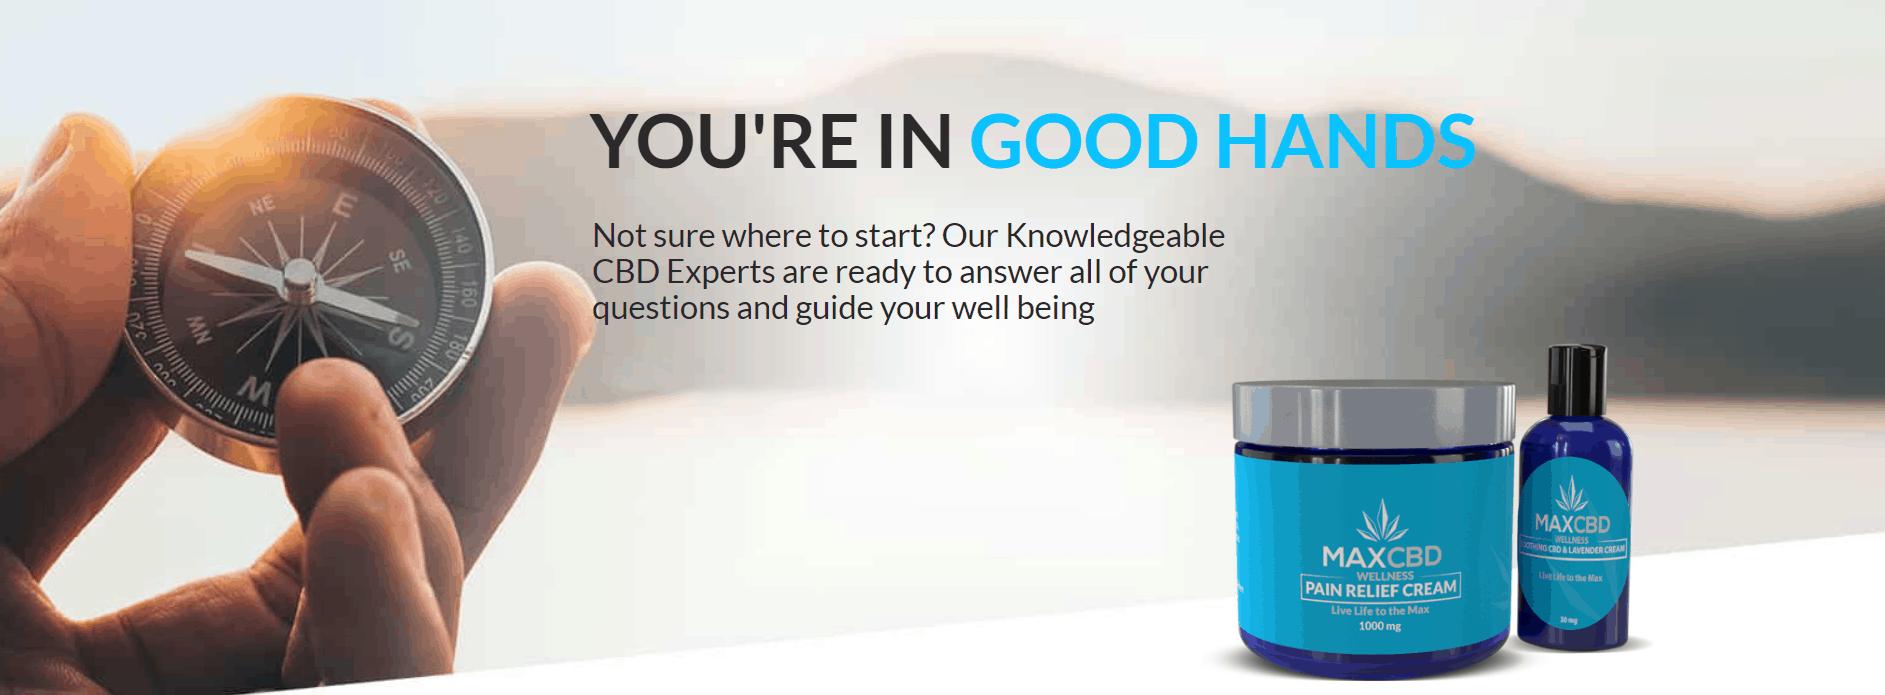 MaxCBD Wellness Coupons Good Hands